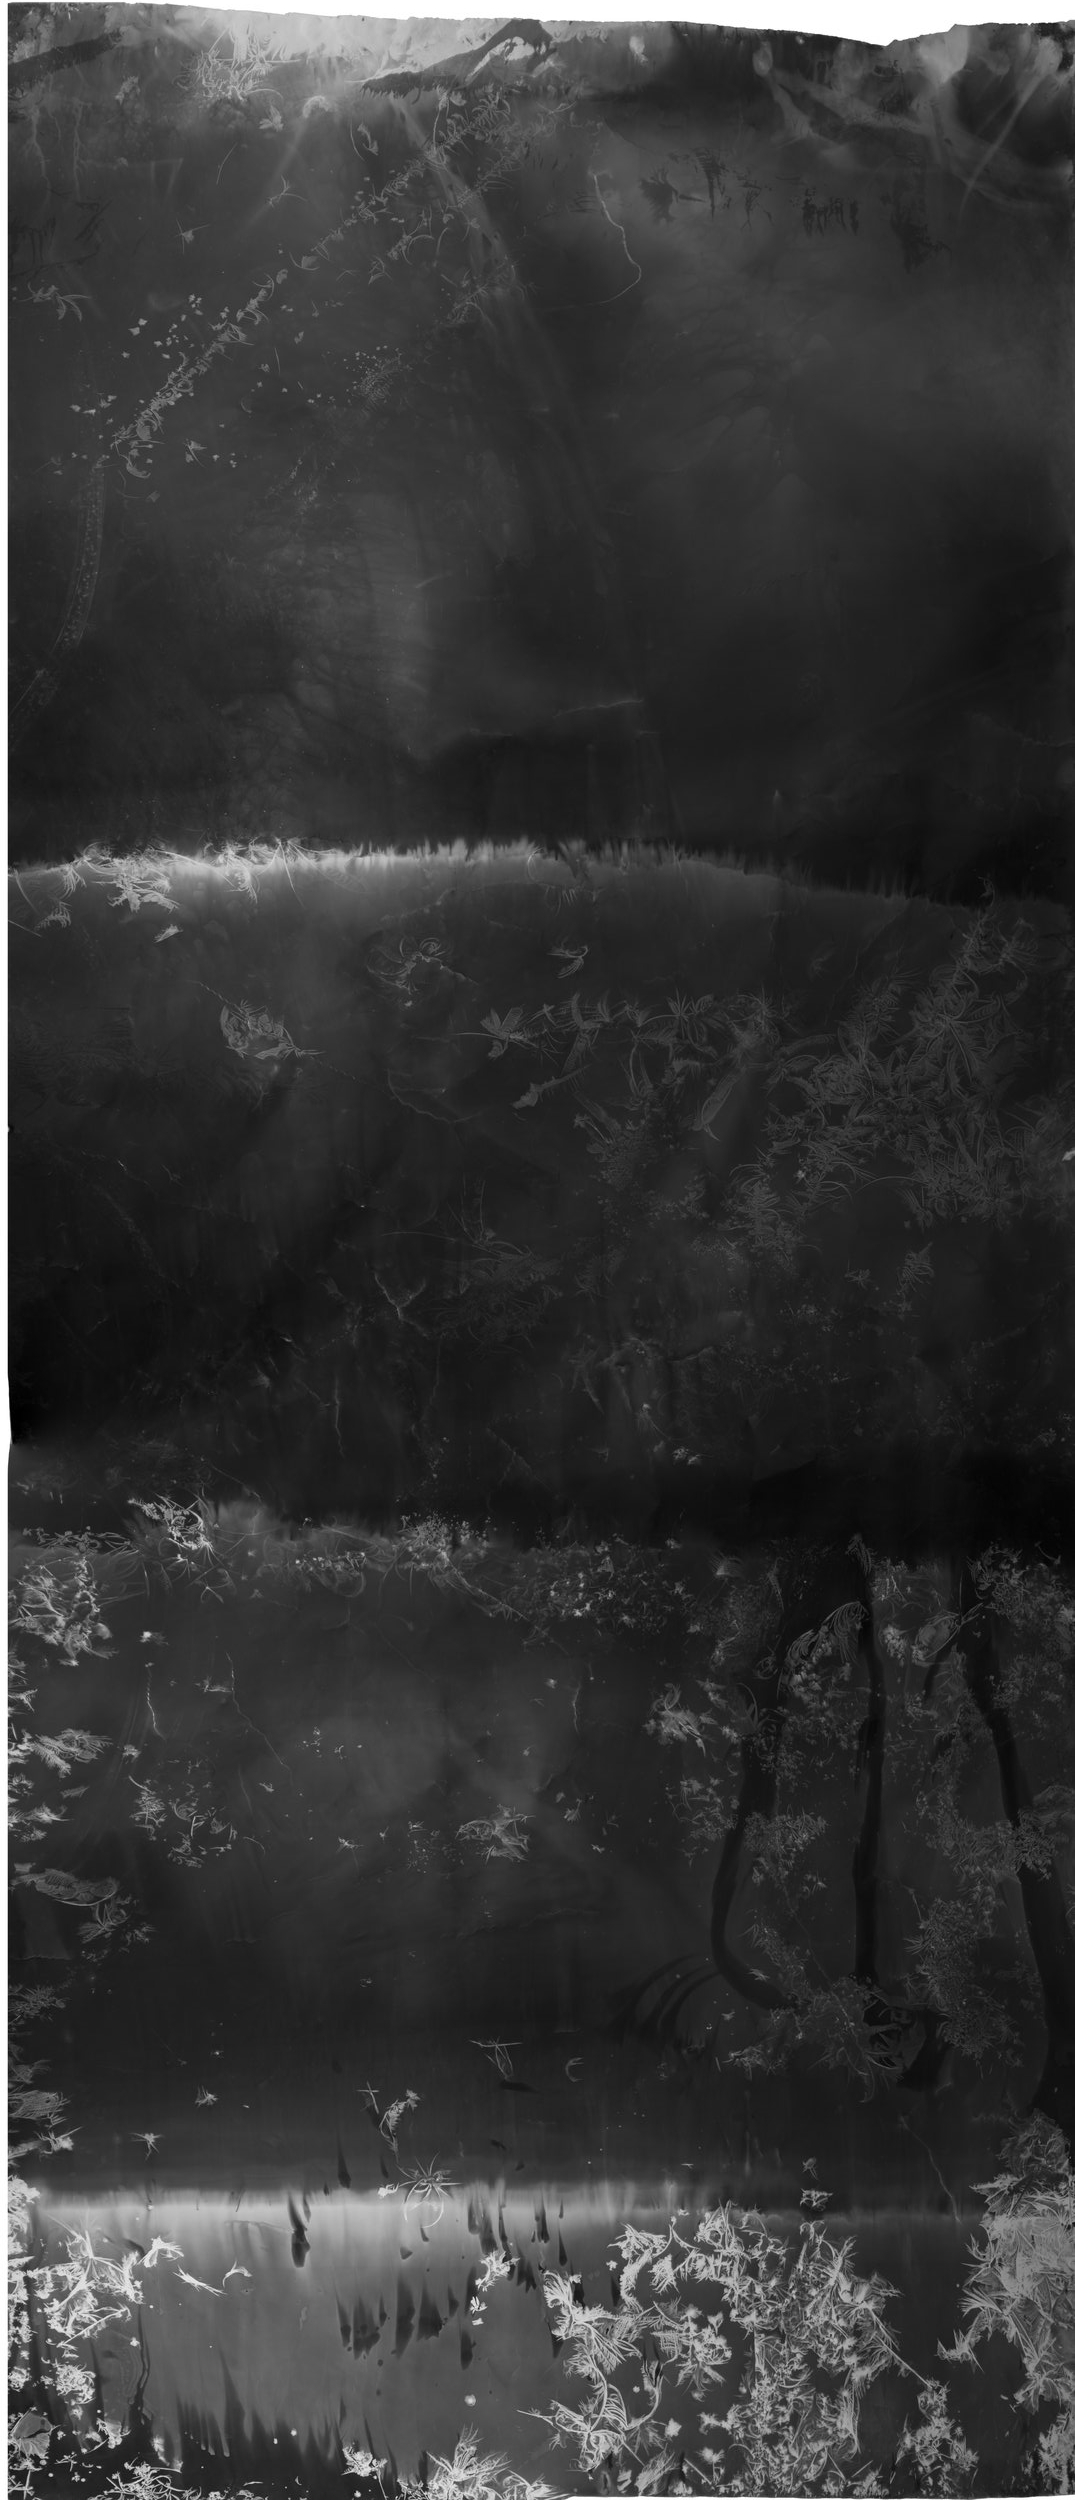 Flashed Waterfall , 2017, 8.66 feet x 3.5 feet, Silver Gelatin Print